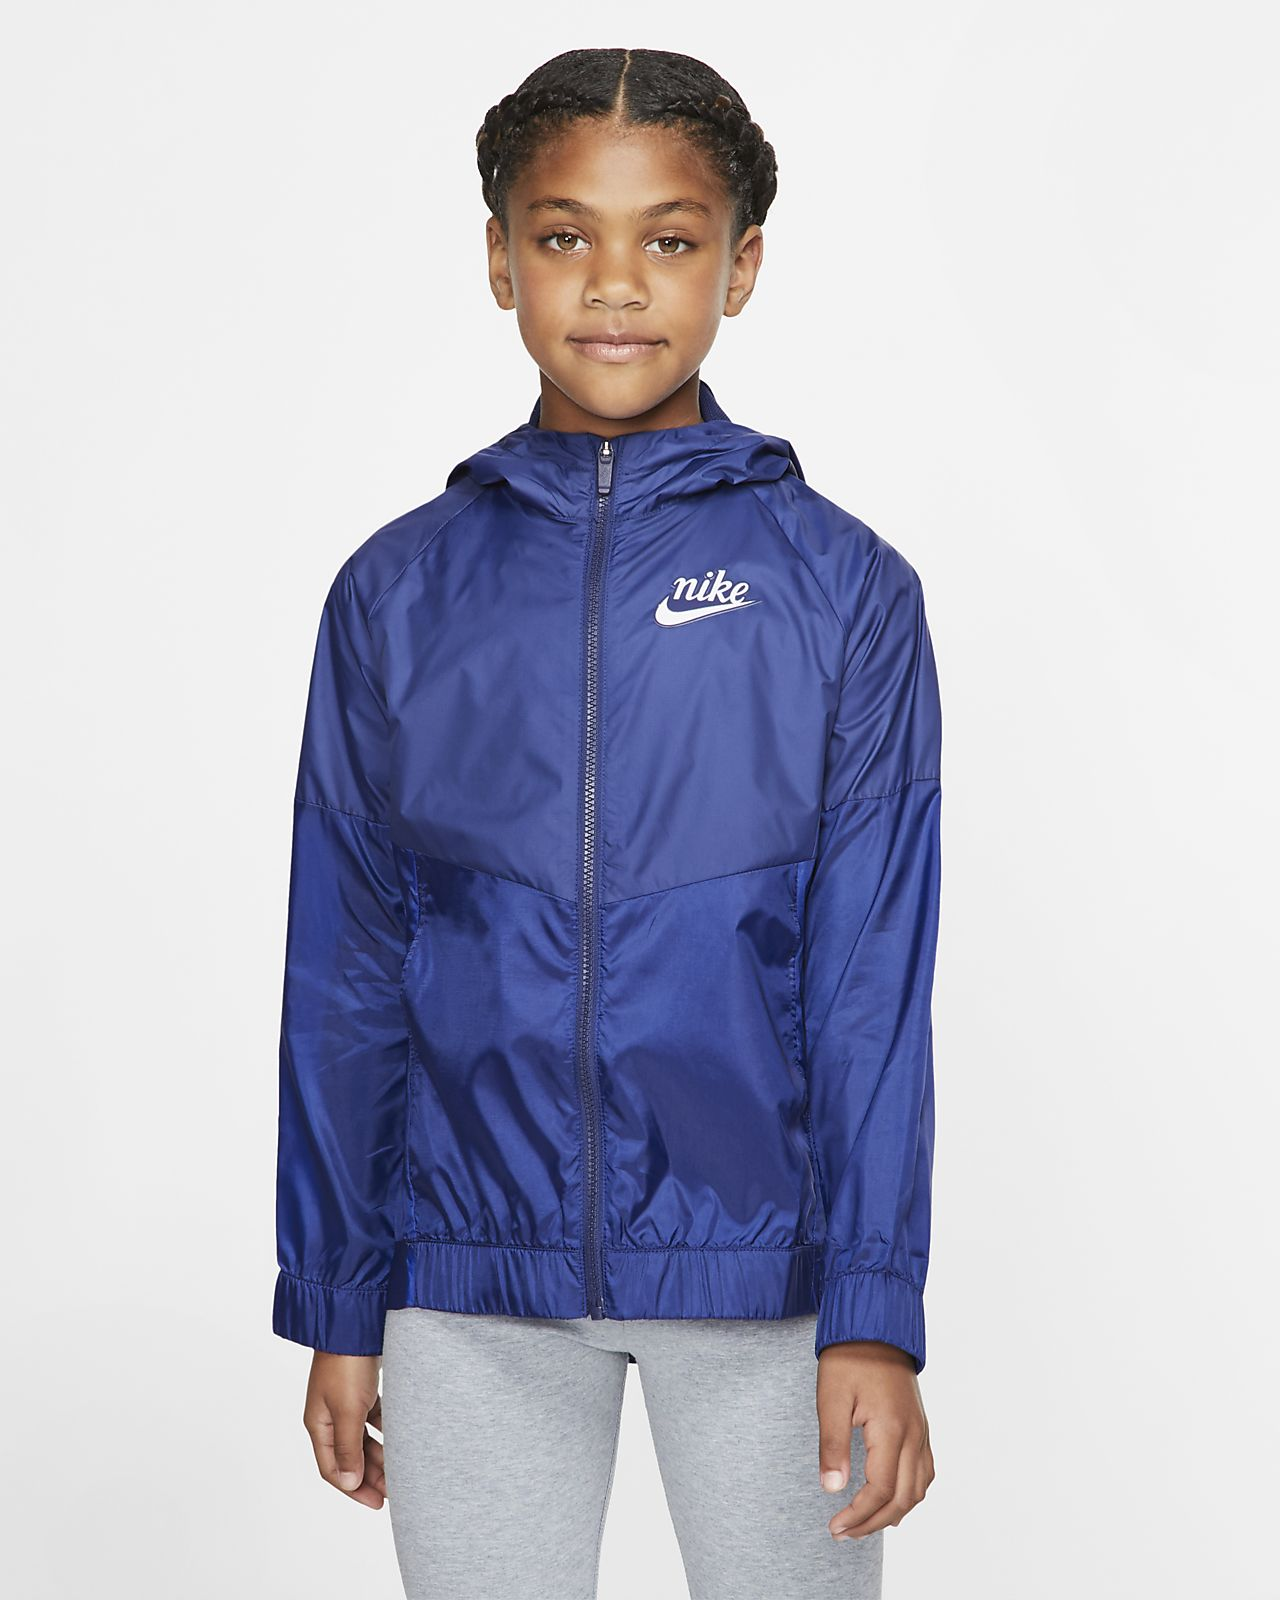 f8c8c677b855c Nike Sportswear Windrunner Big Kids' Jacket. Nike.com